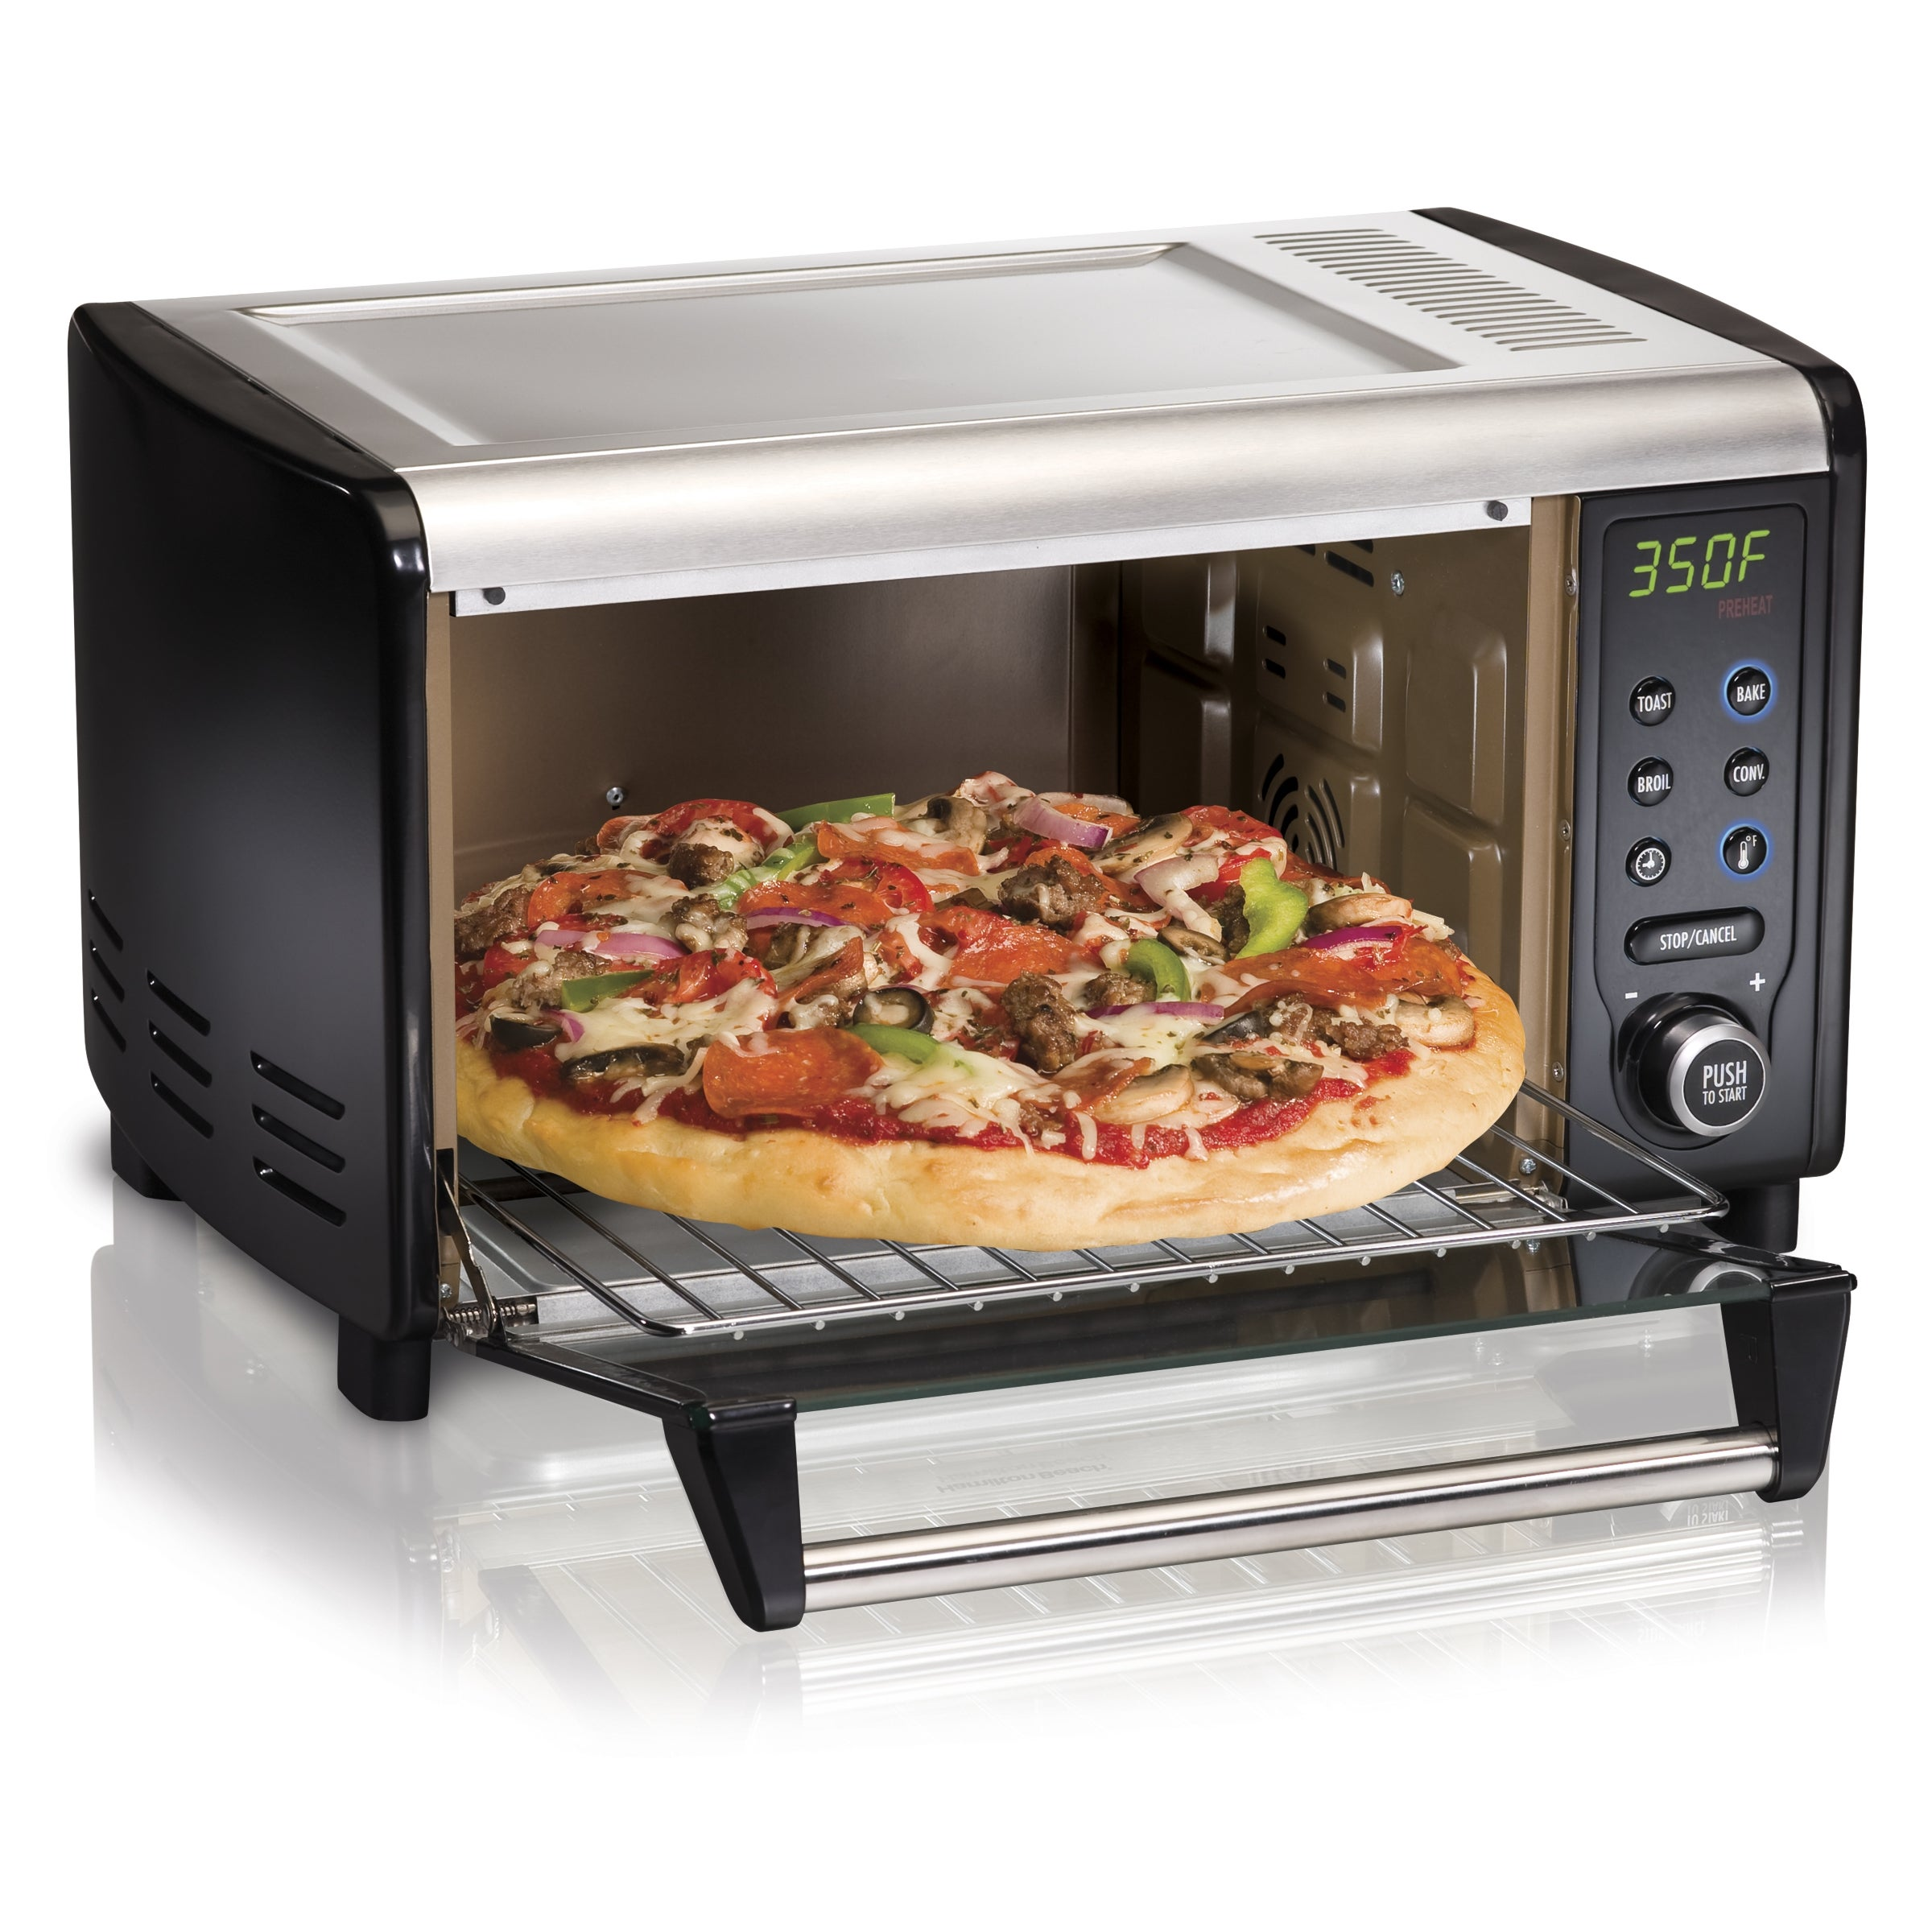 Hamilton Beach 31151 Digital Convection Oven with Easy-Clean Interior